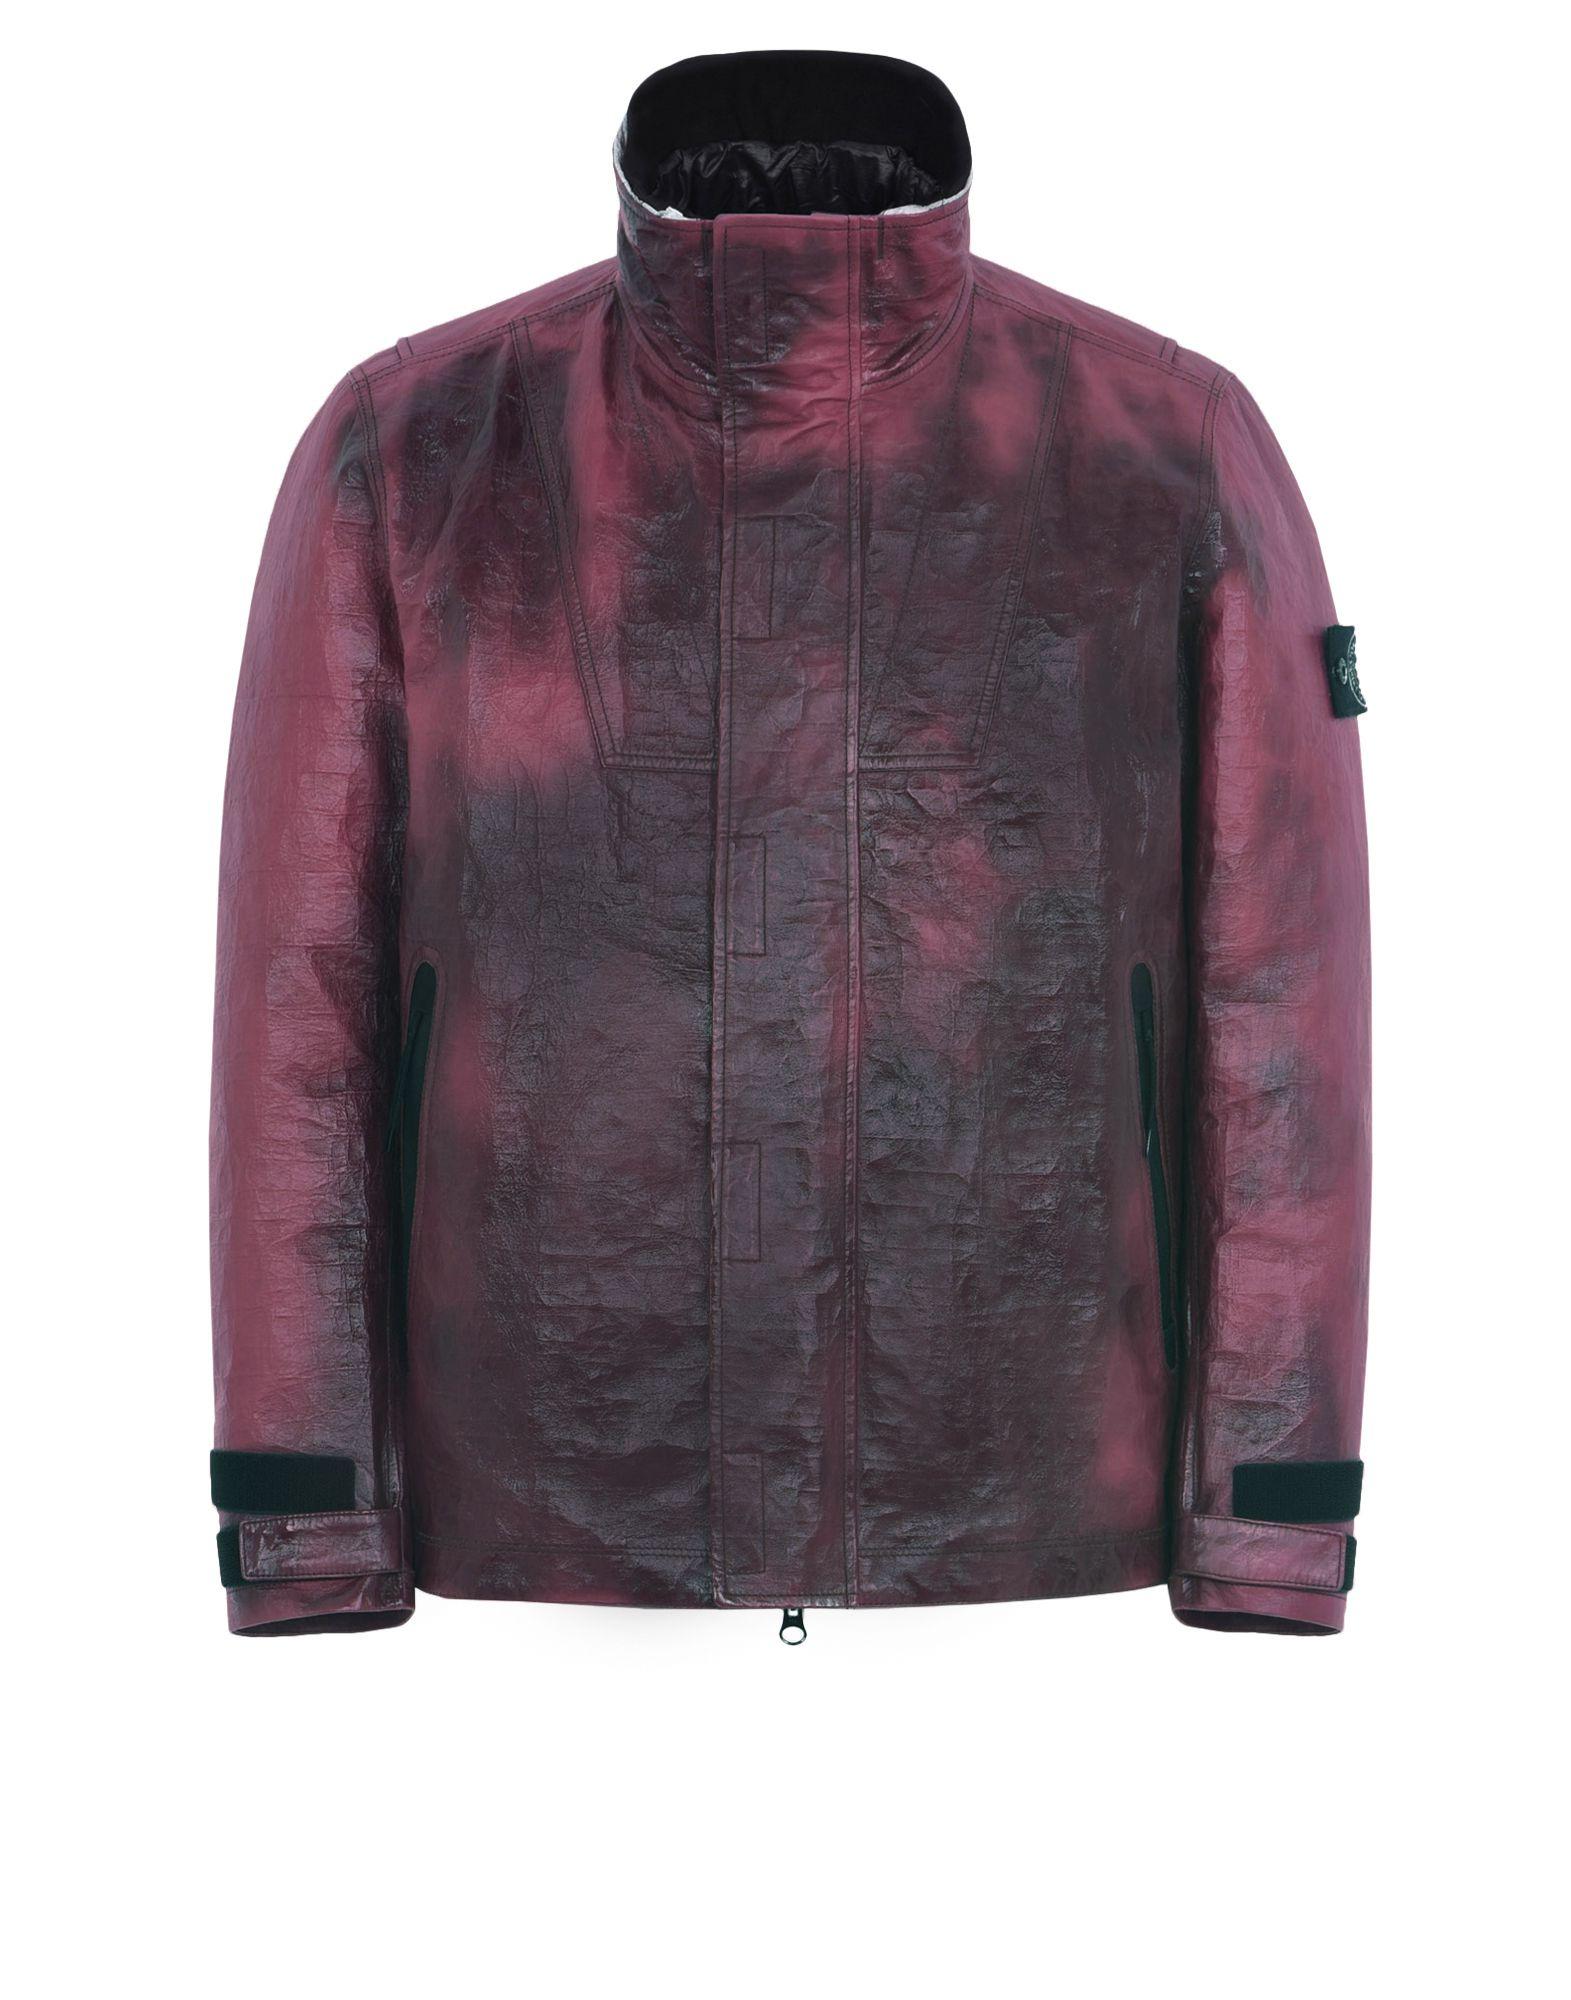 STONE ISLAND Leather Jacket 00199 ICE JACKET IN DYNEEMA® BONDED LEATHER